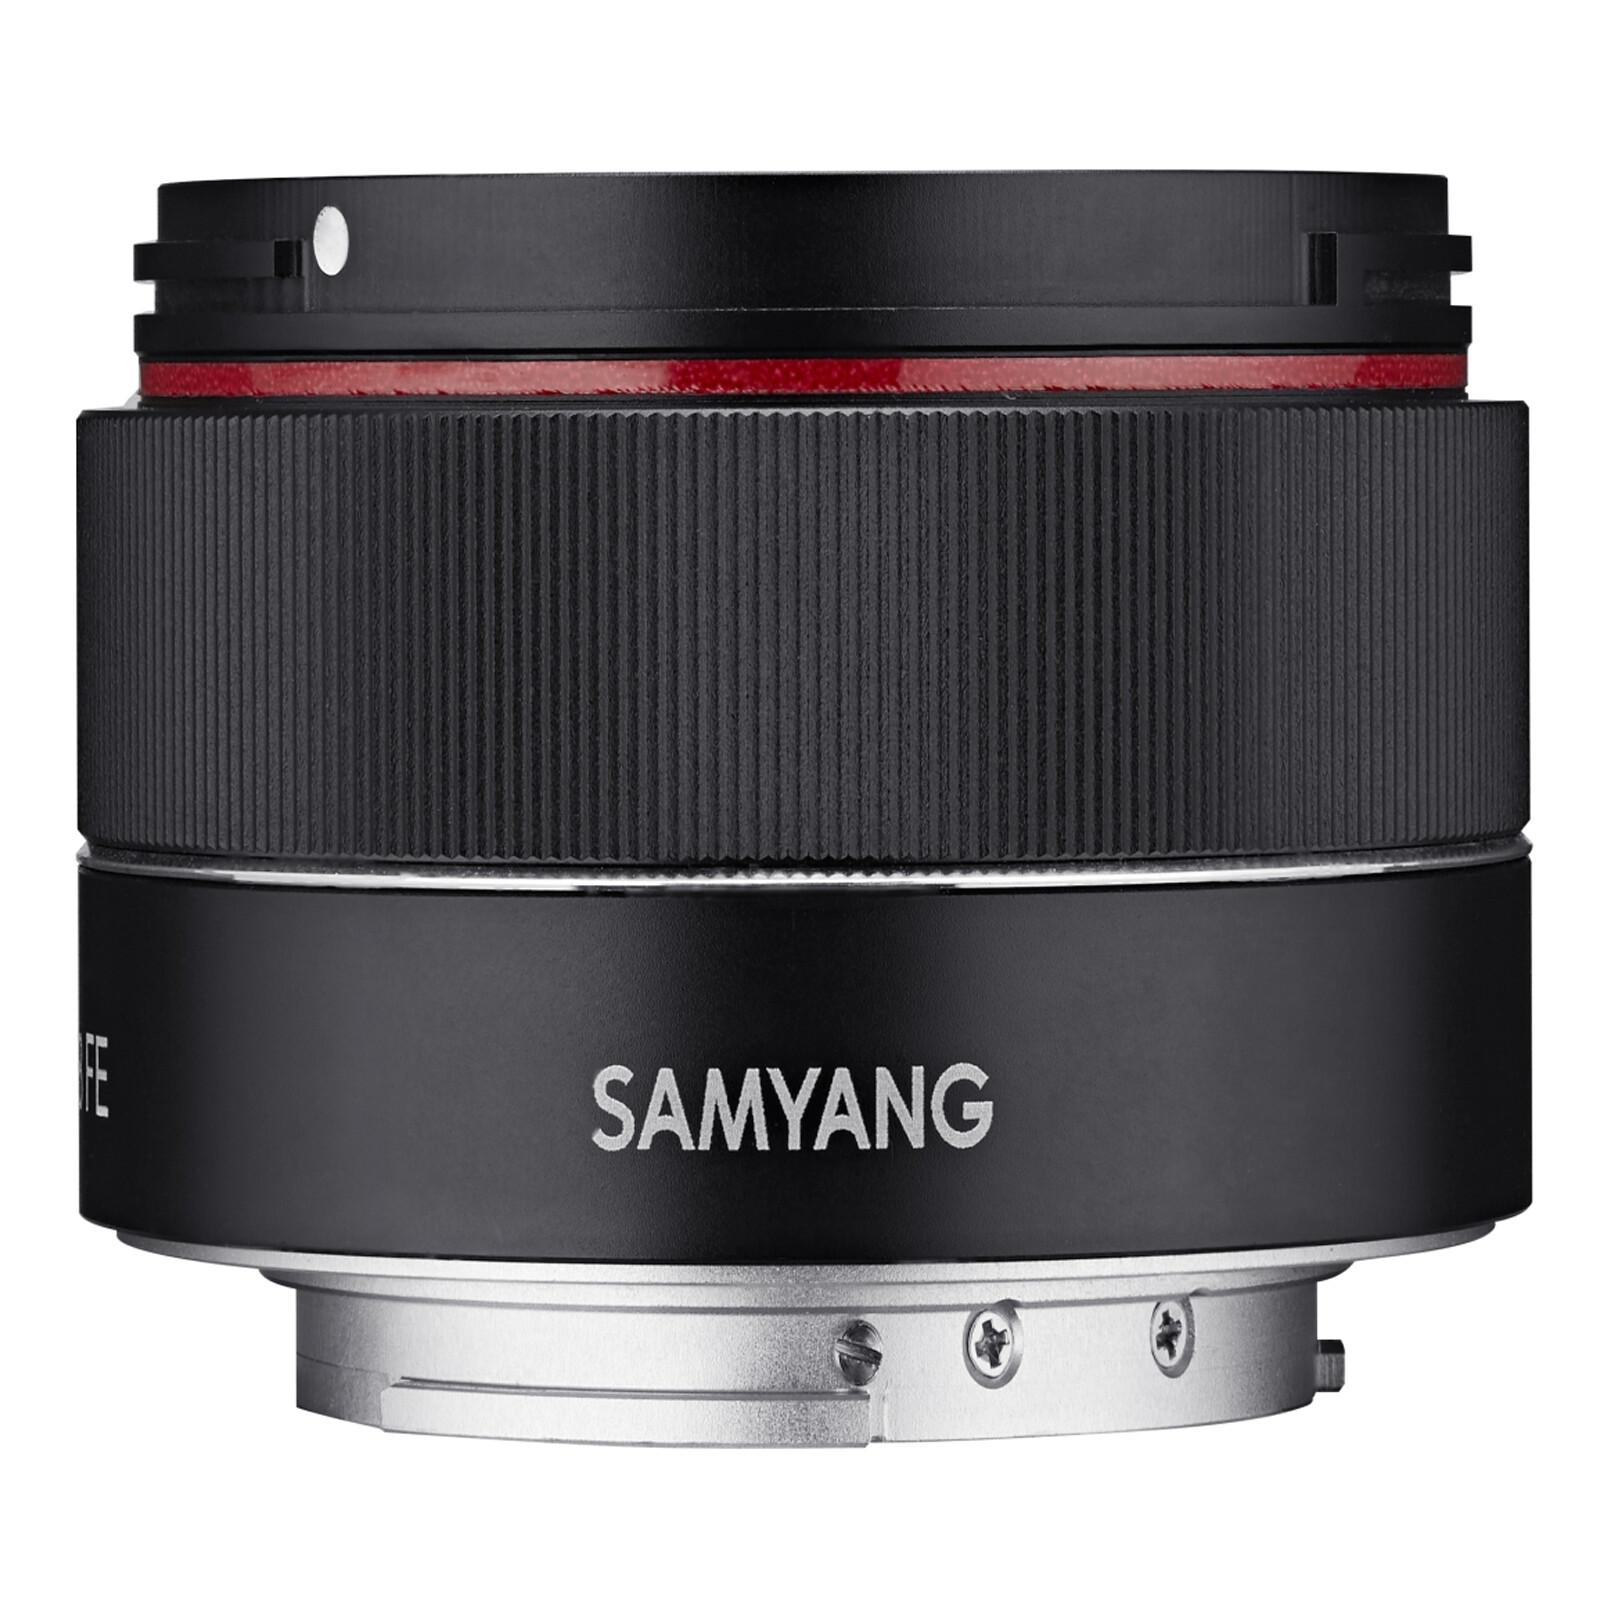 Samyang AF 35/2,8 Autofokus Sony E